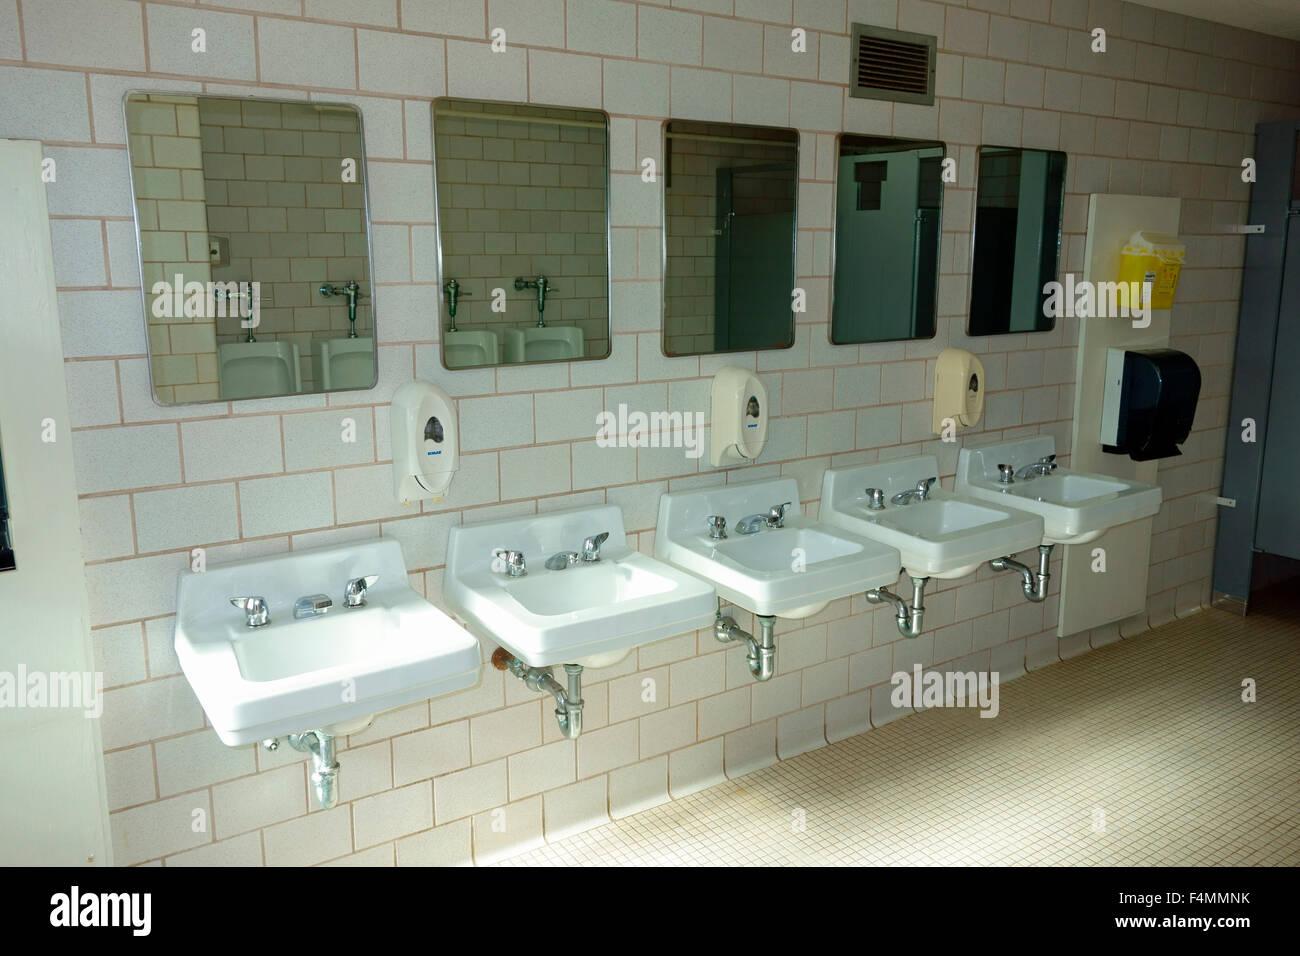 A Row Of Sinks In A Public Washroom Bathroom Restroom Latrine Stock Photo Alamy